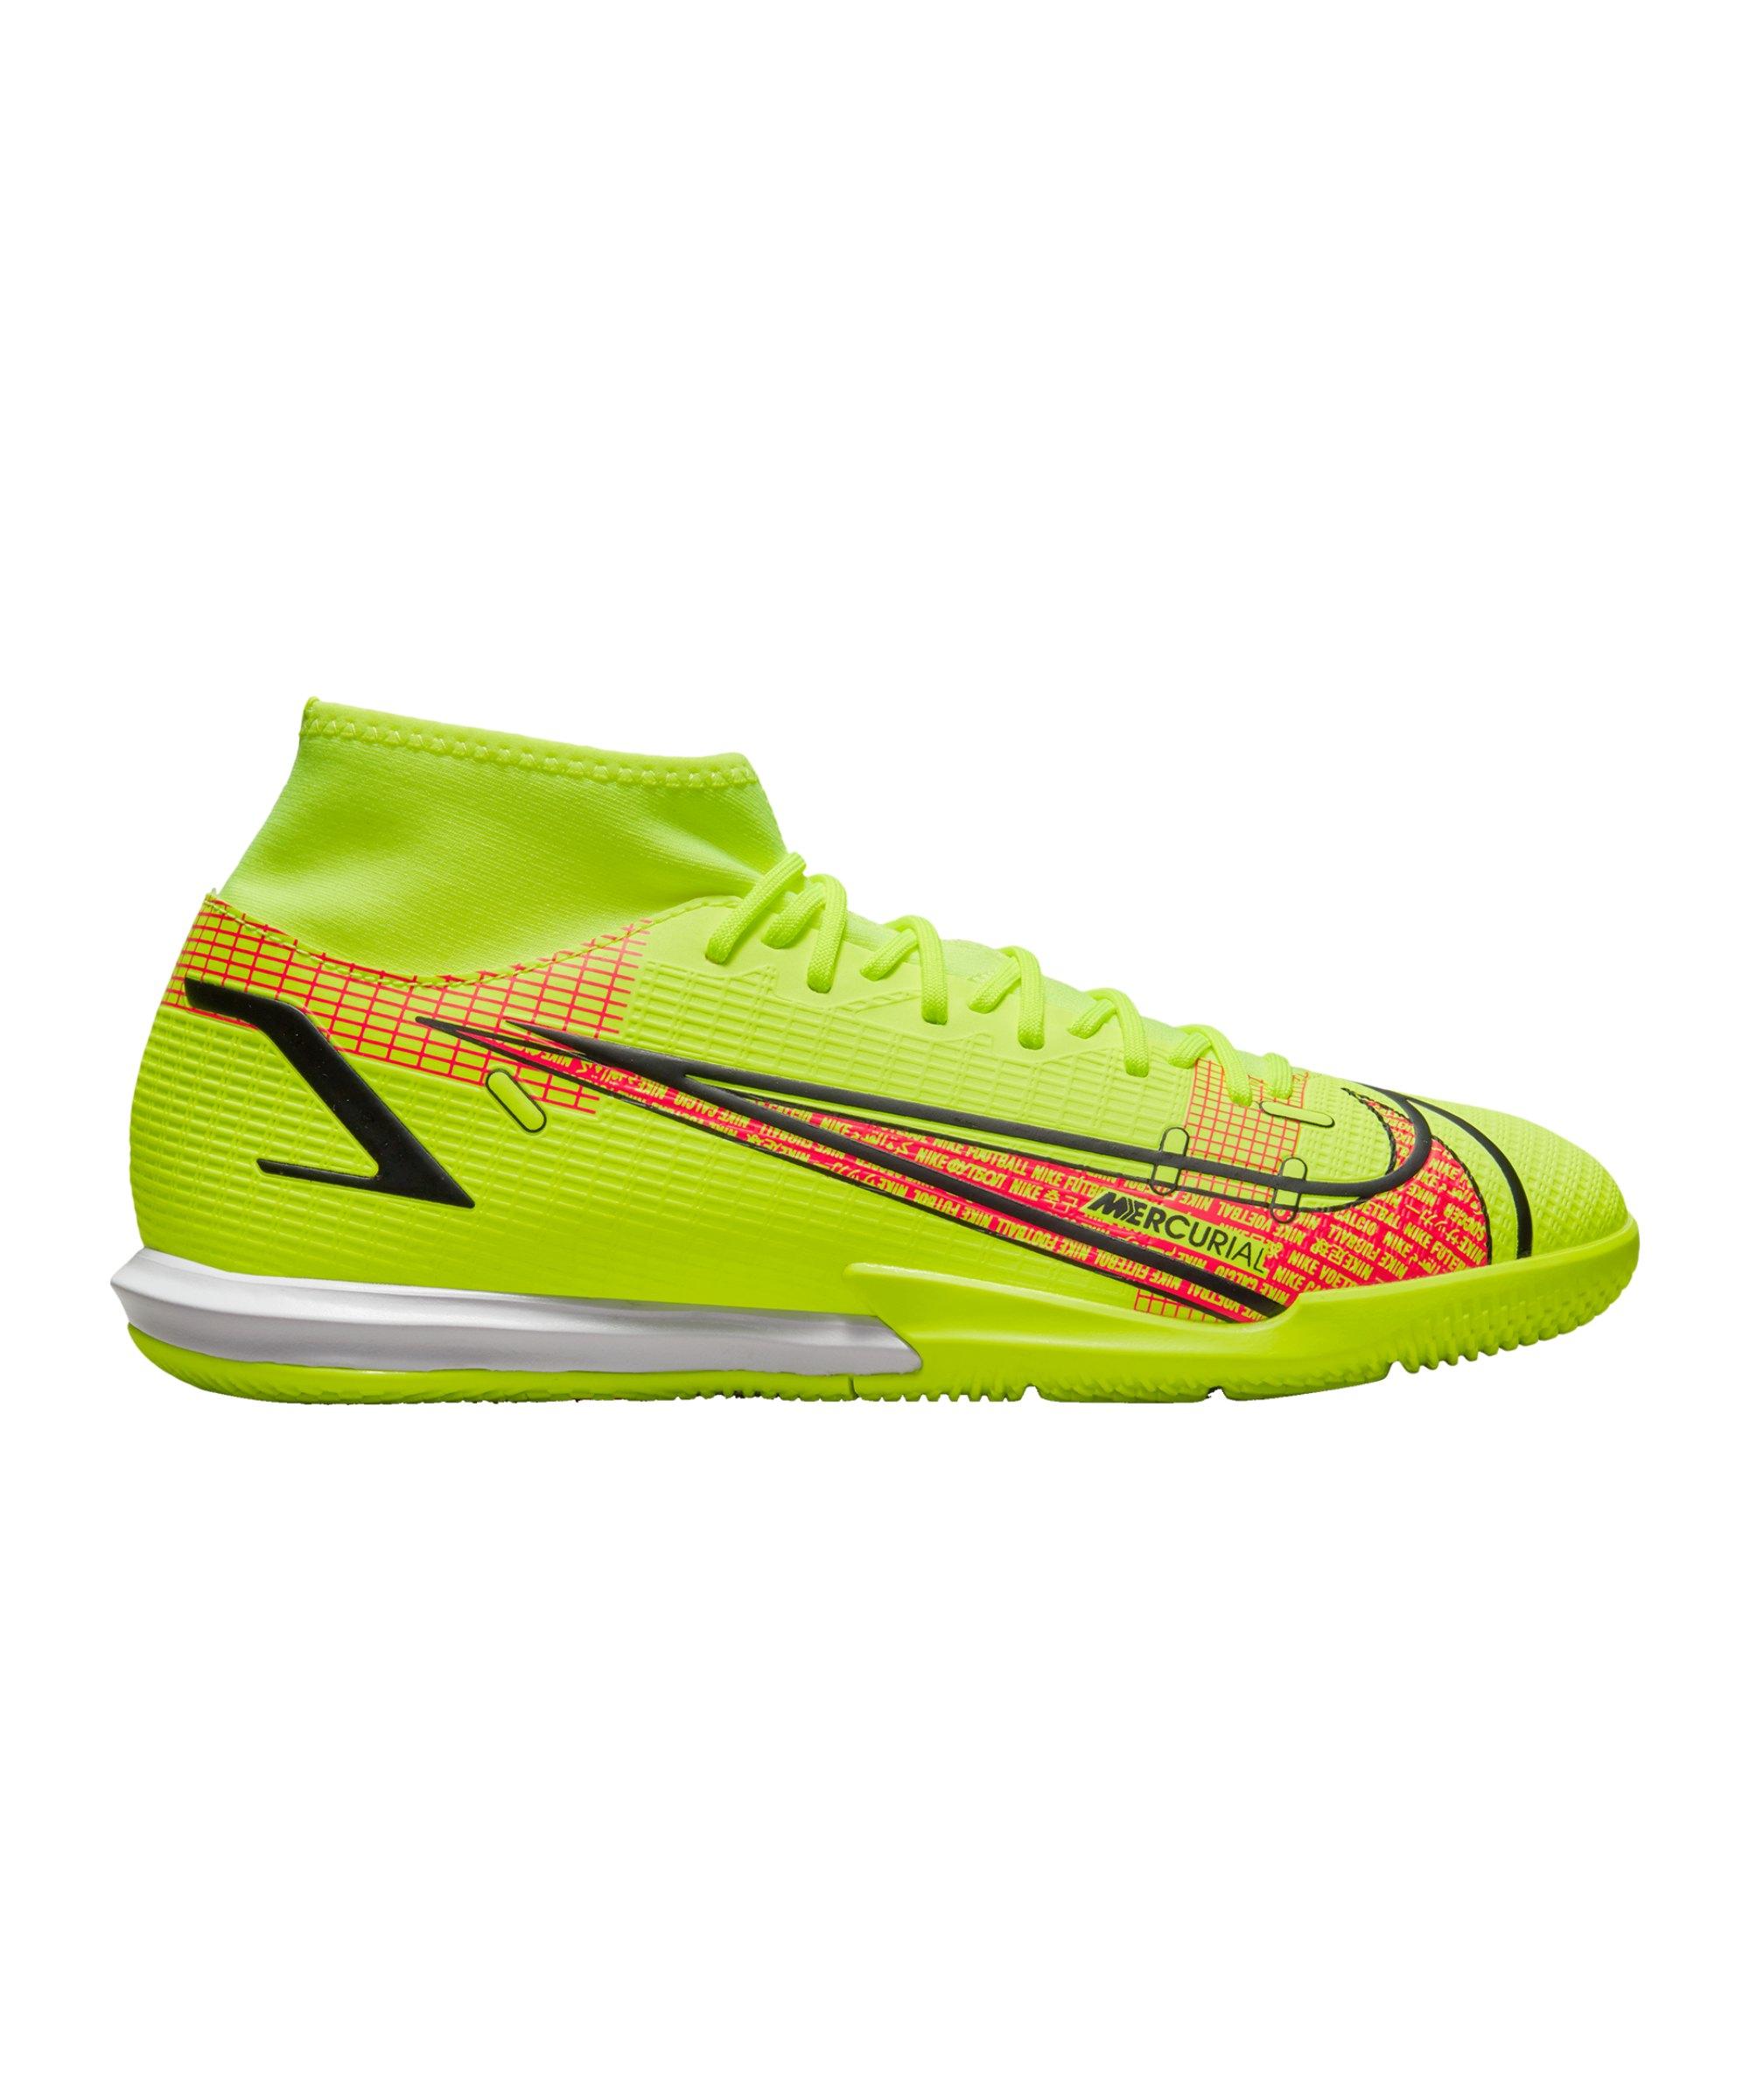 Nike Mercurial Superfly VIII Motivation Academy IC Gelb F760 - gelb